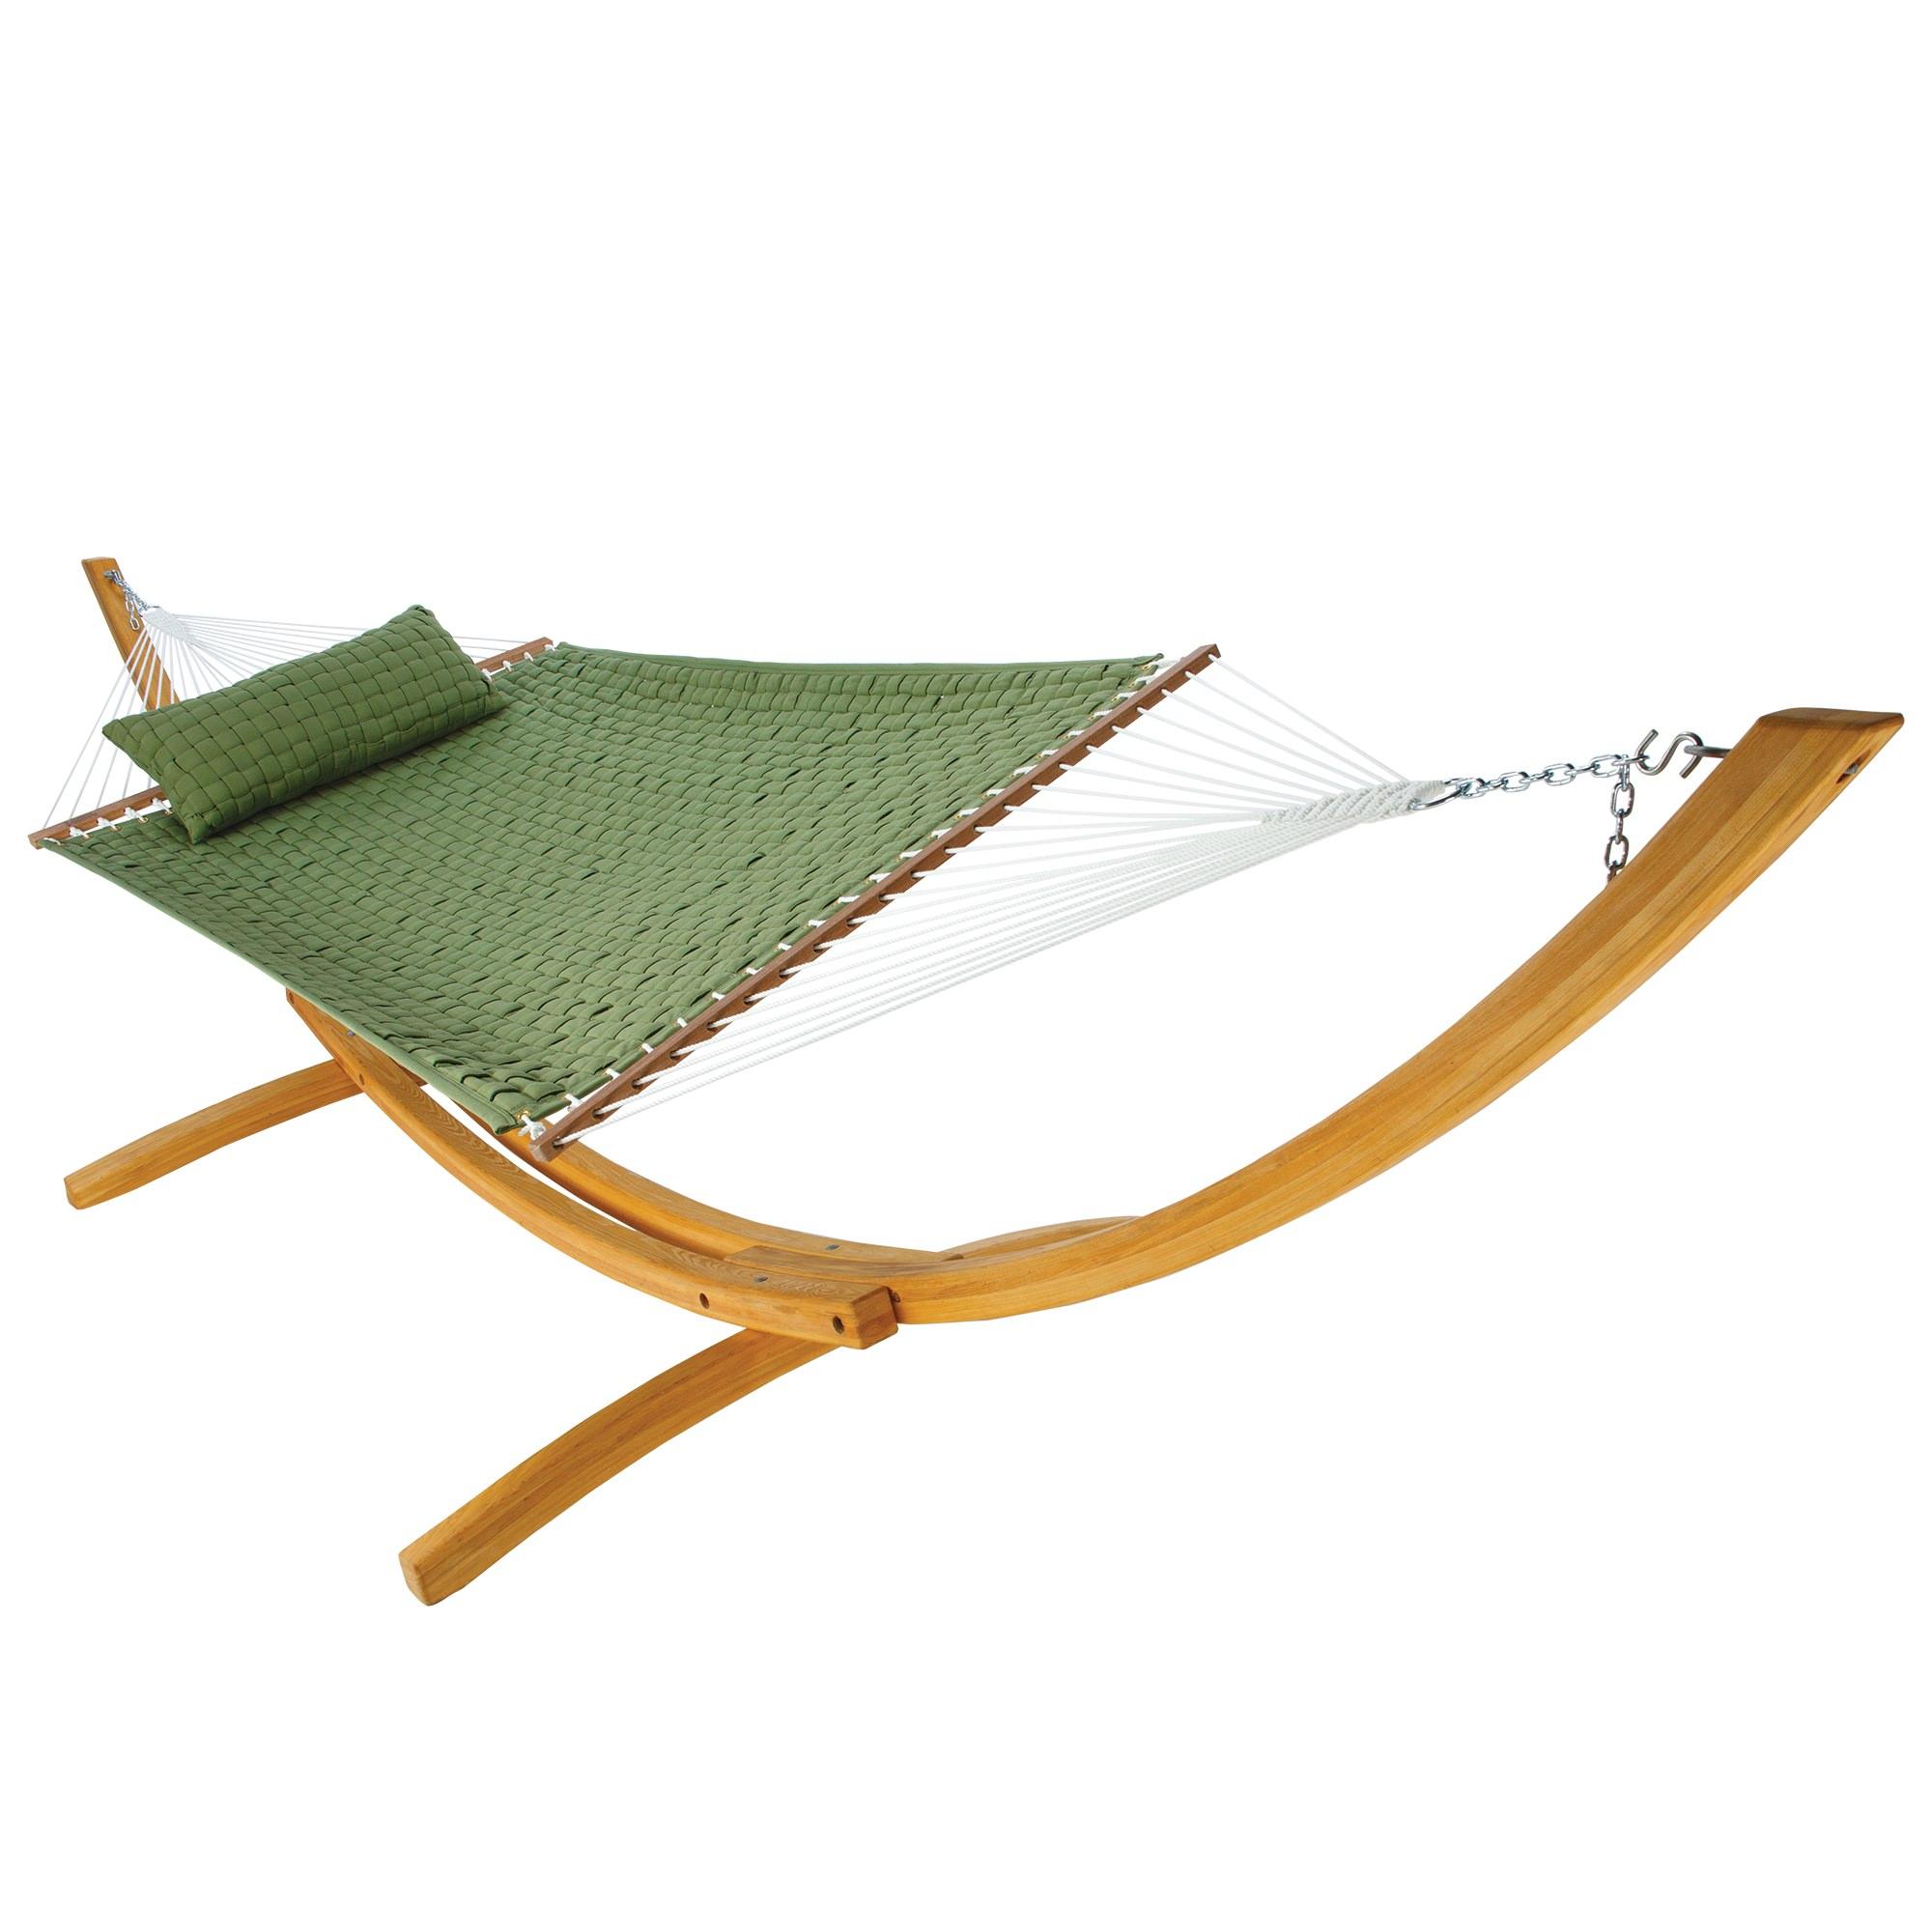 soft weave hammock   light green     hatteras hammocks light green soft weave hammock  rh   hatterashammocks